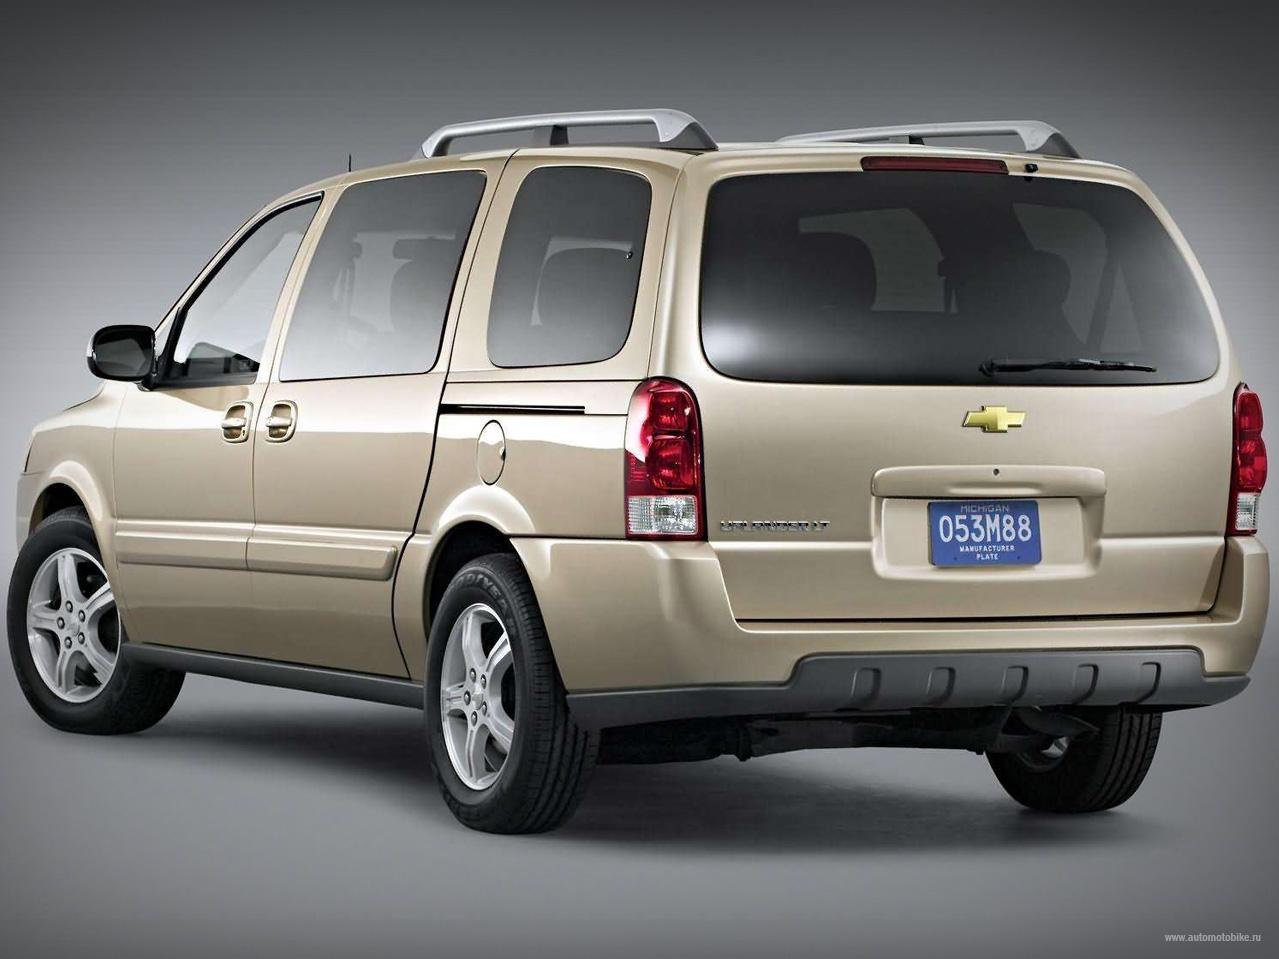 Chevrolet Uplander 2014 foto - 1